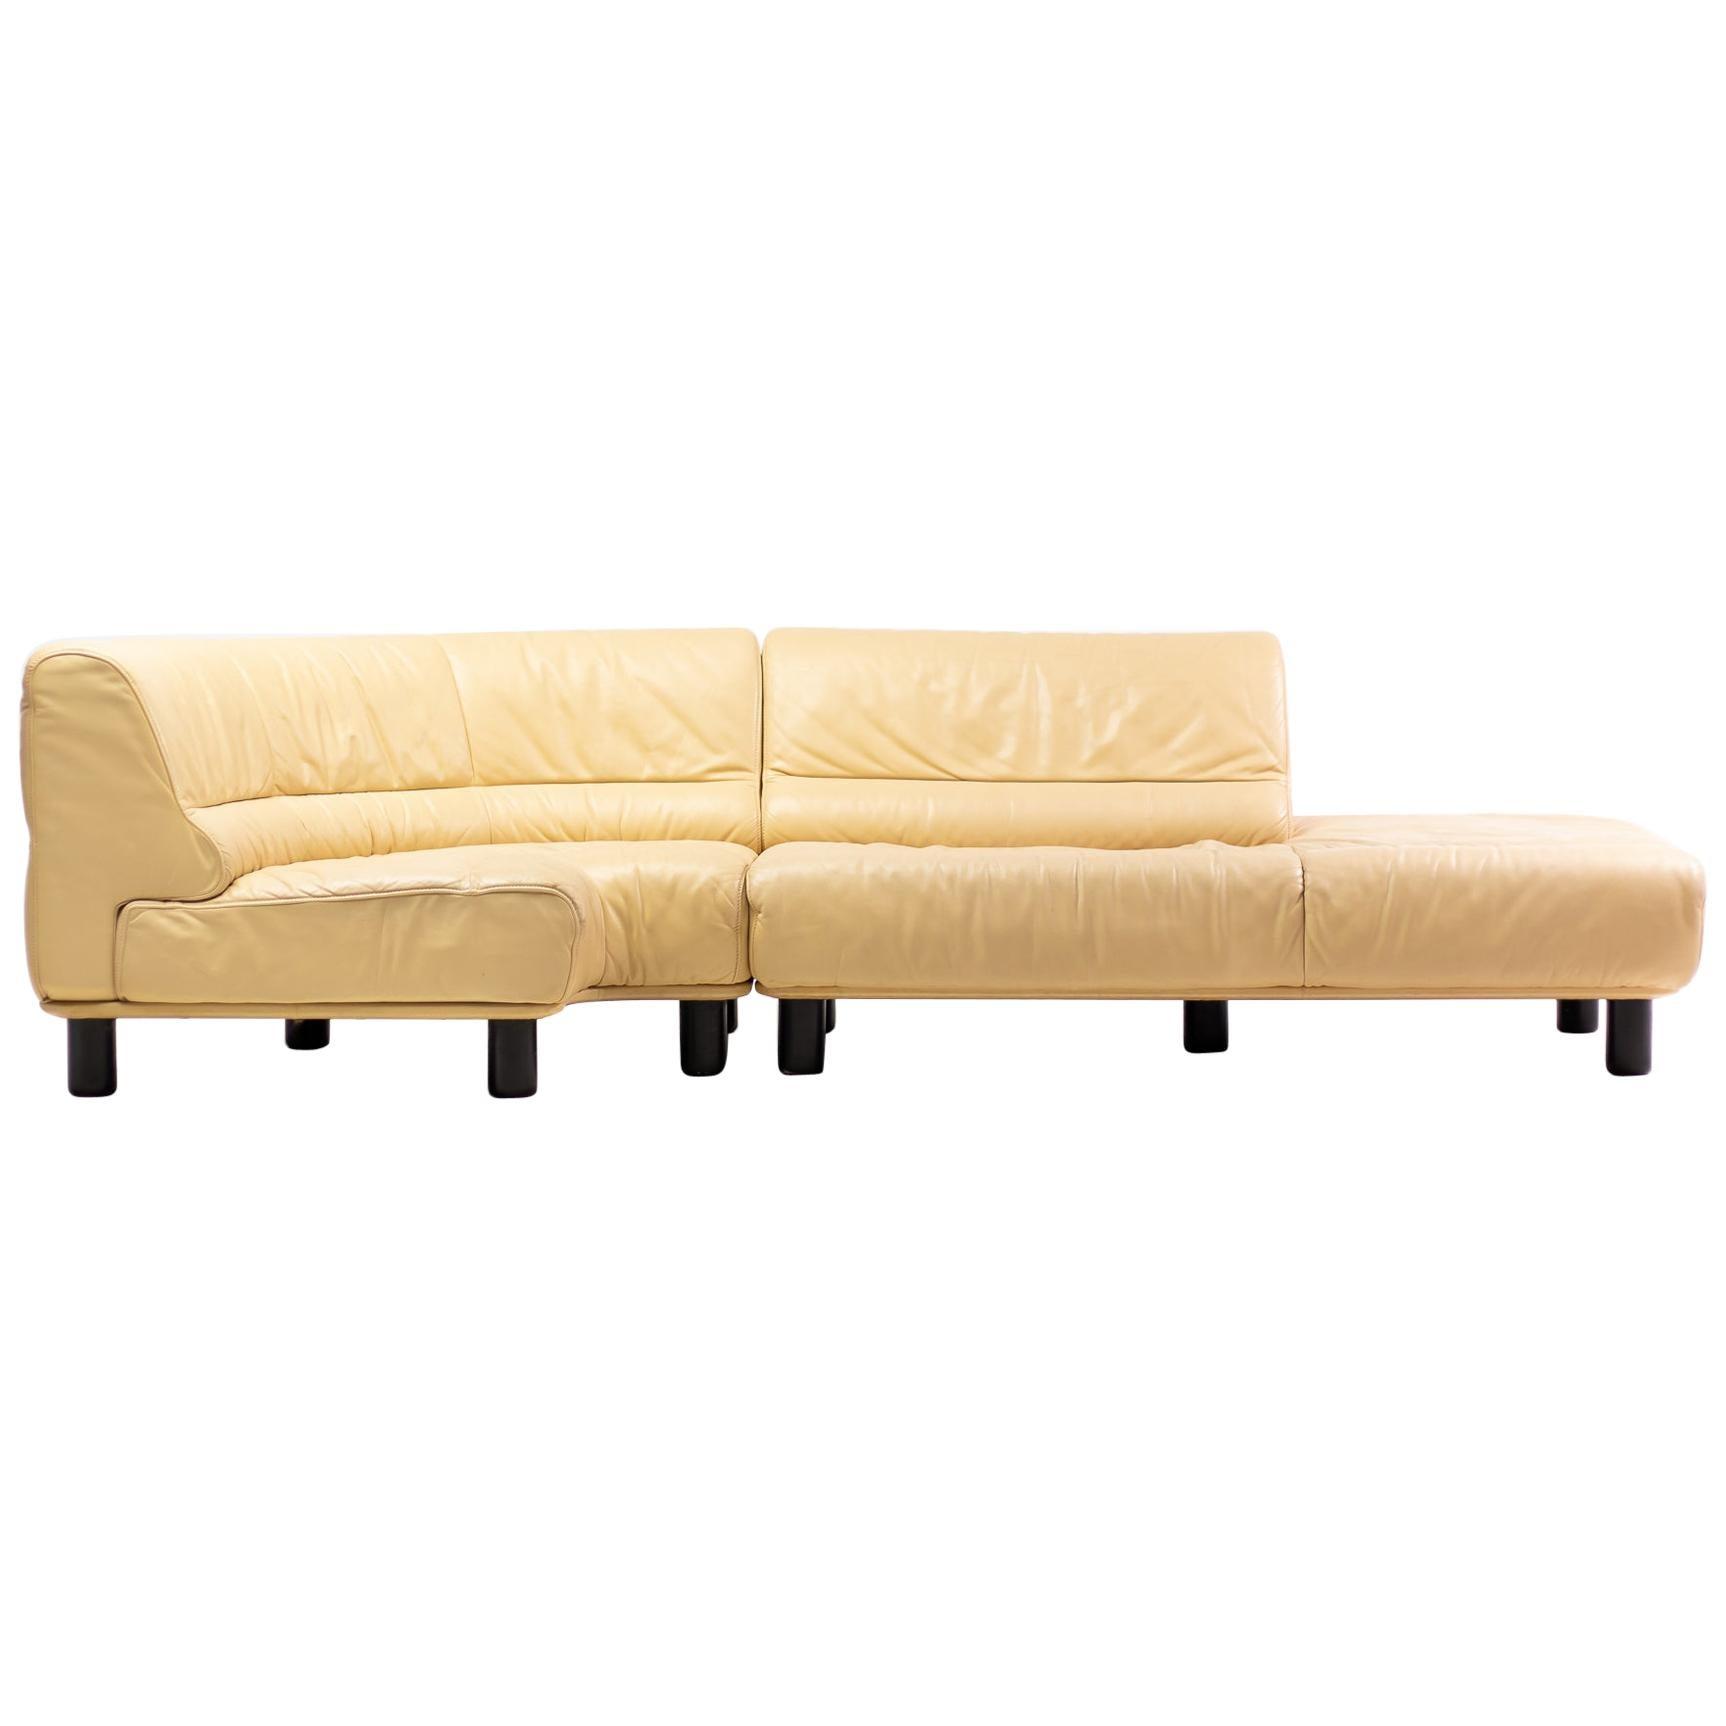 De Sede DS-18 Sofa in Biscuit Leather